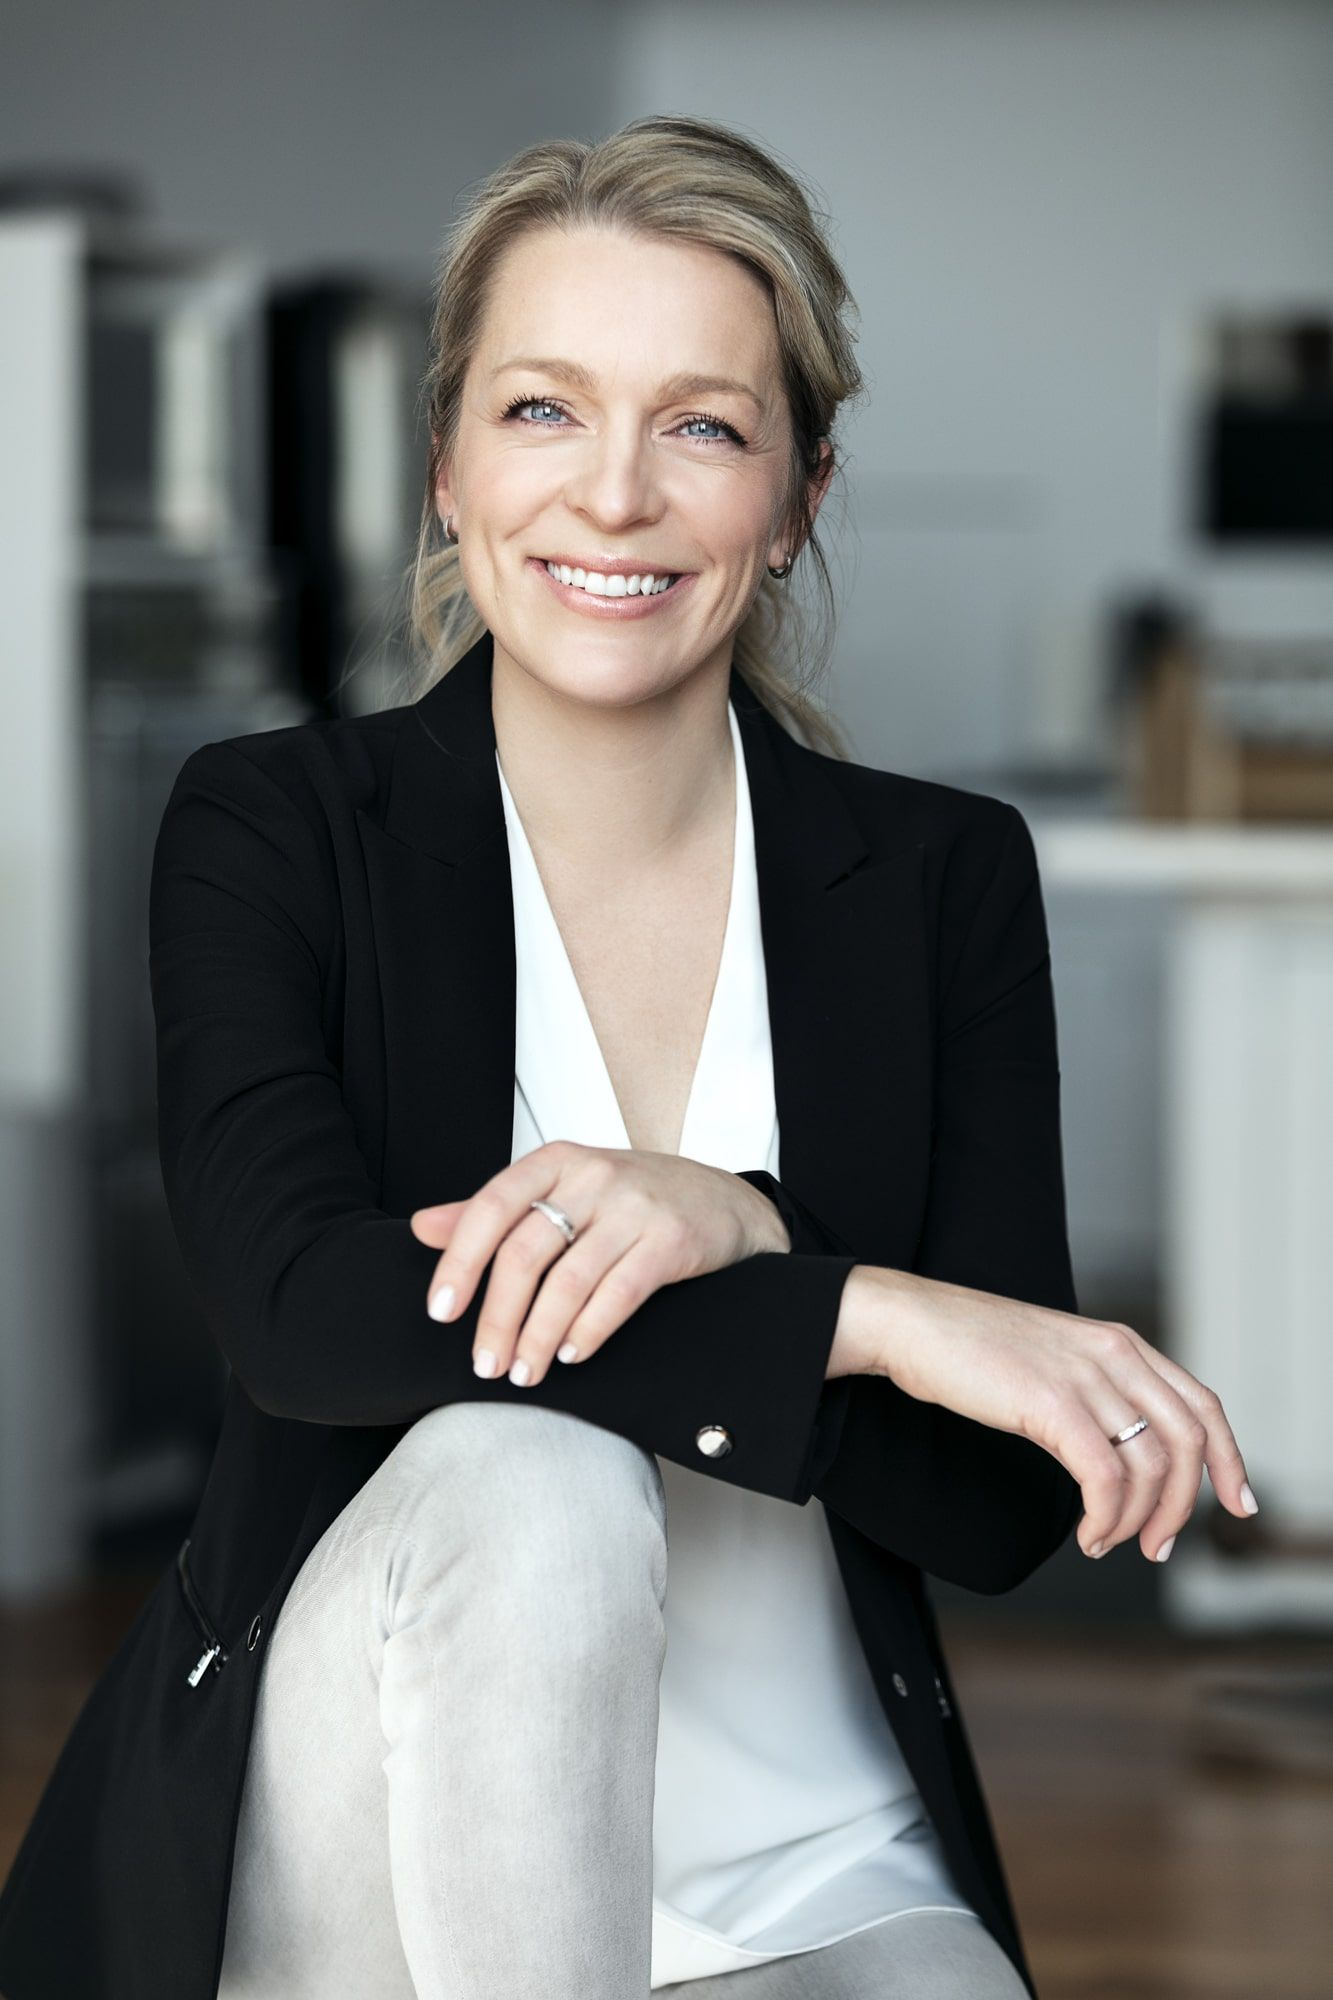 Suzie Villeneuve, Artiste/Entrepreneure (Canada)